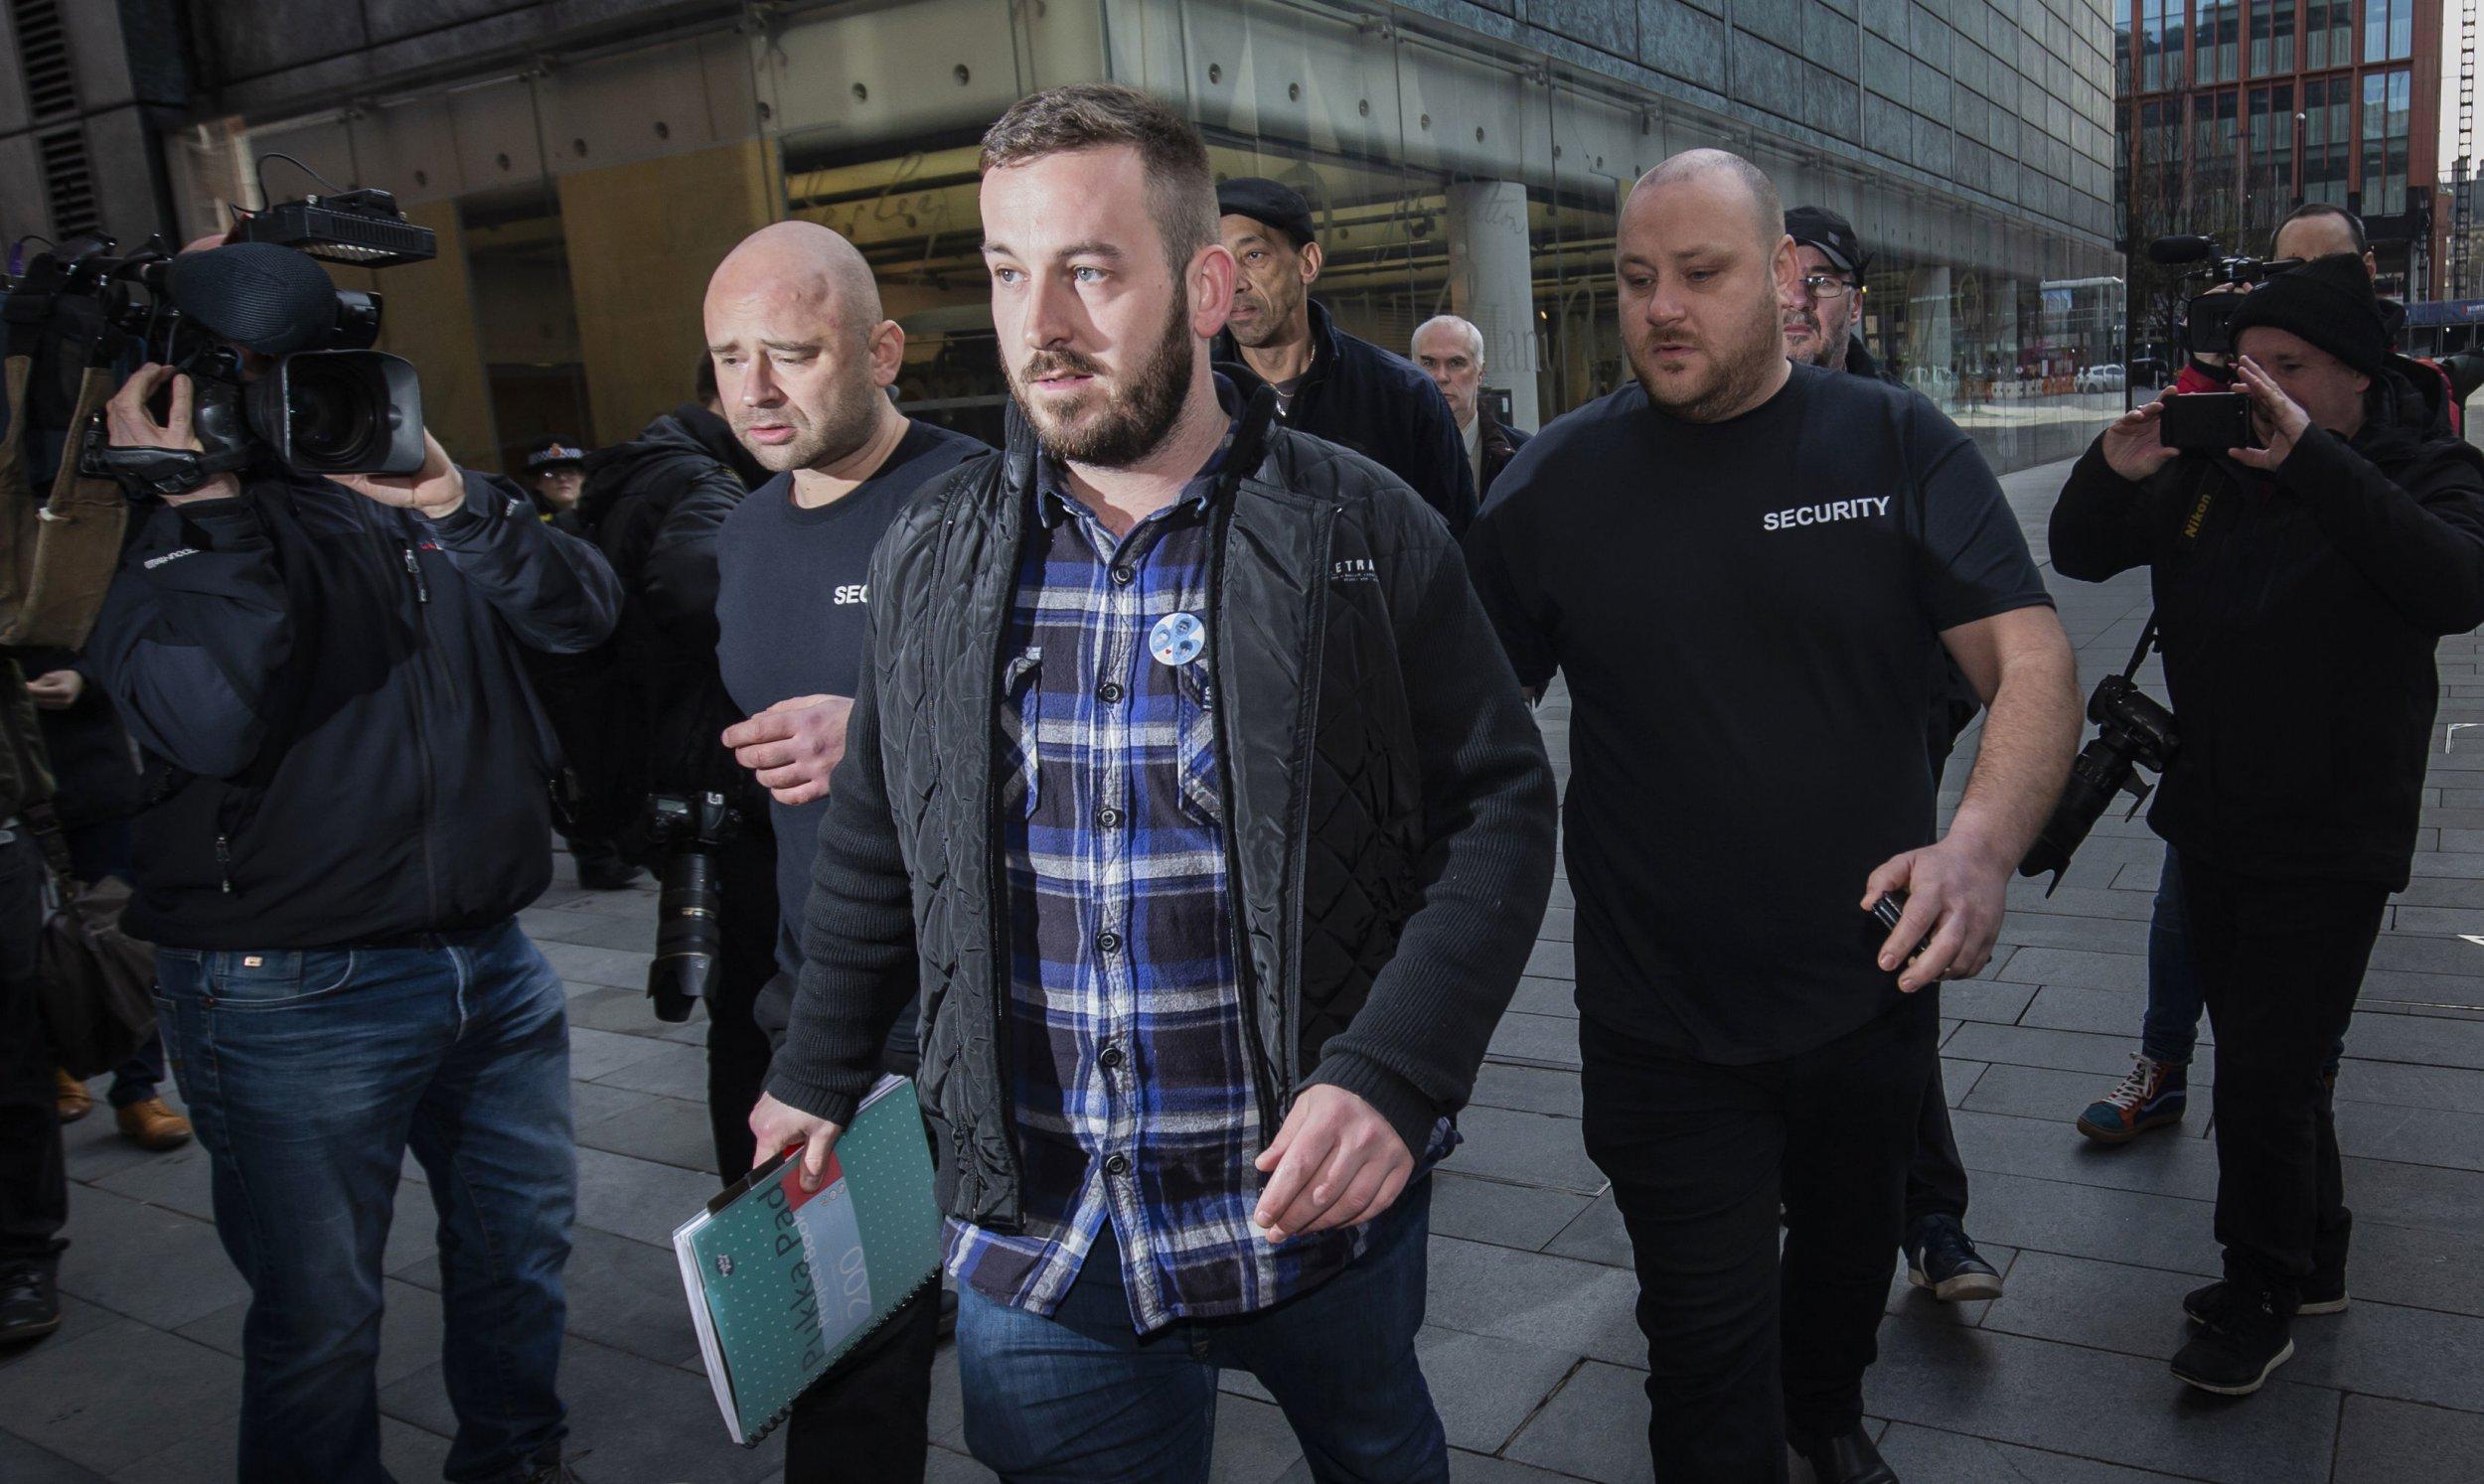 Yellow vest leader James Goddard demands journalists leave assault hearing